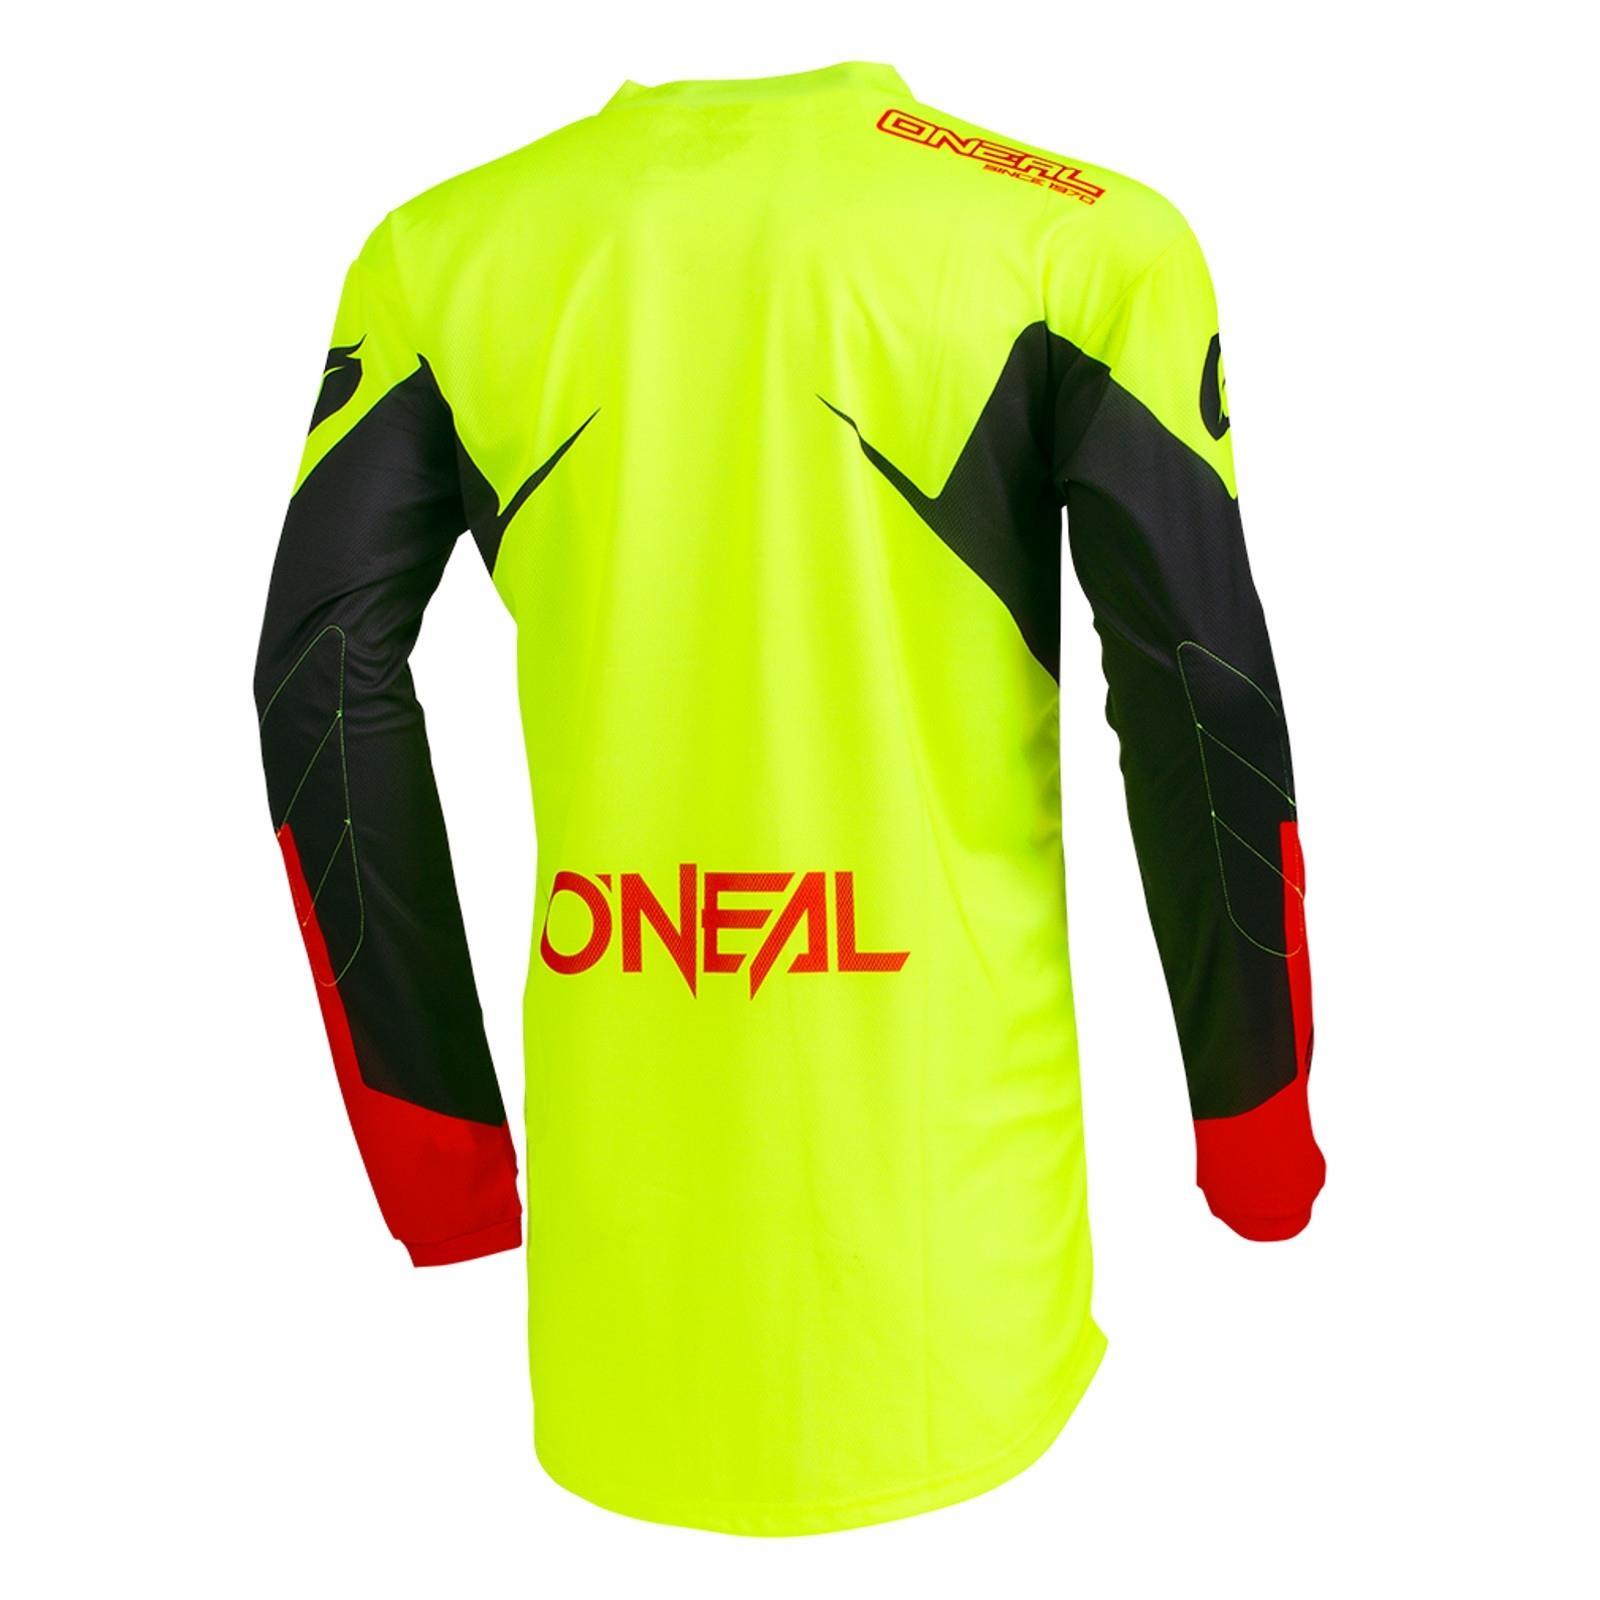 O-039-Neal-Element-Racewear-MOTOCROSS-JERSEY-MX-ENDURO-CROSS-MAGLIA-MOUNTAIN-BIKE miniatura 11